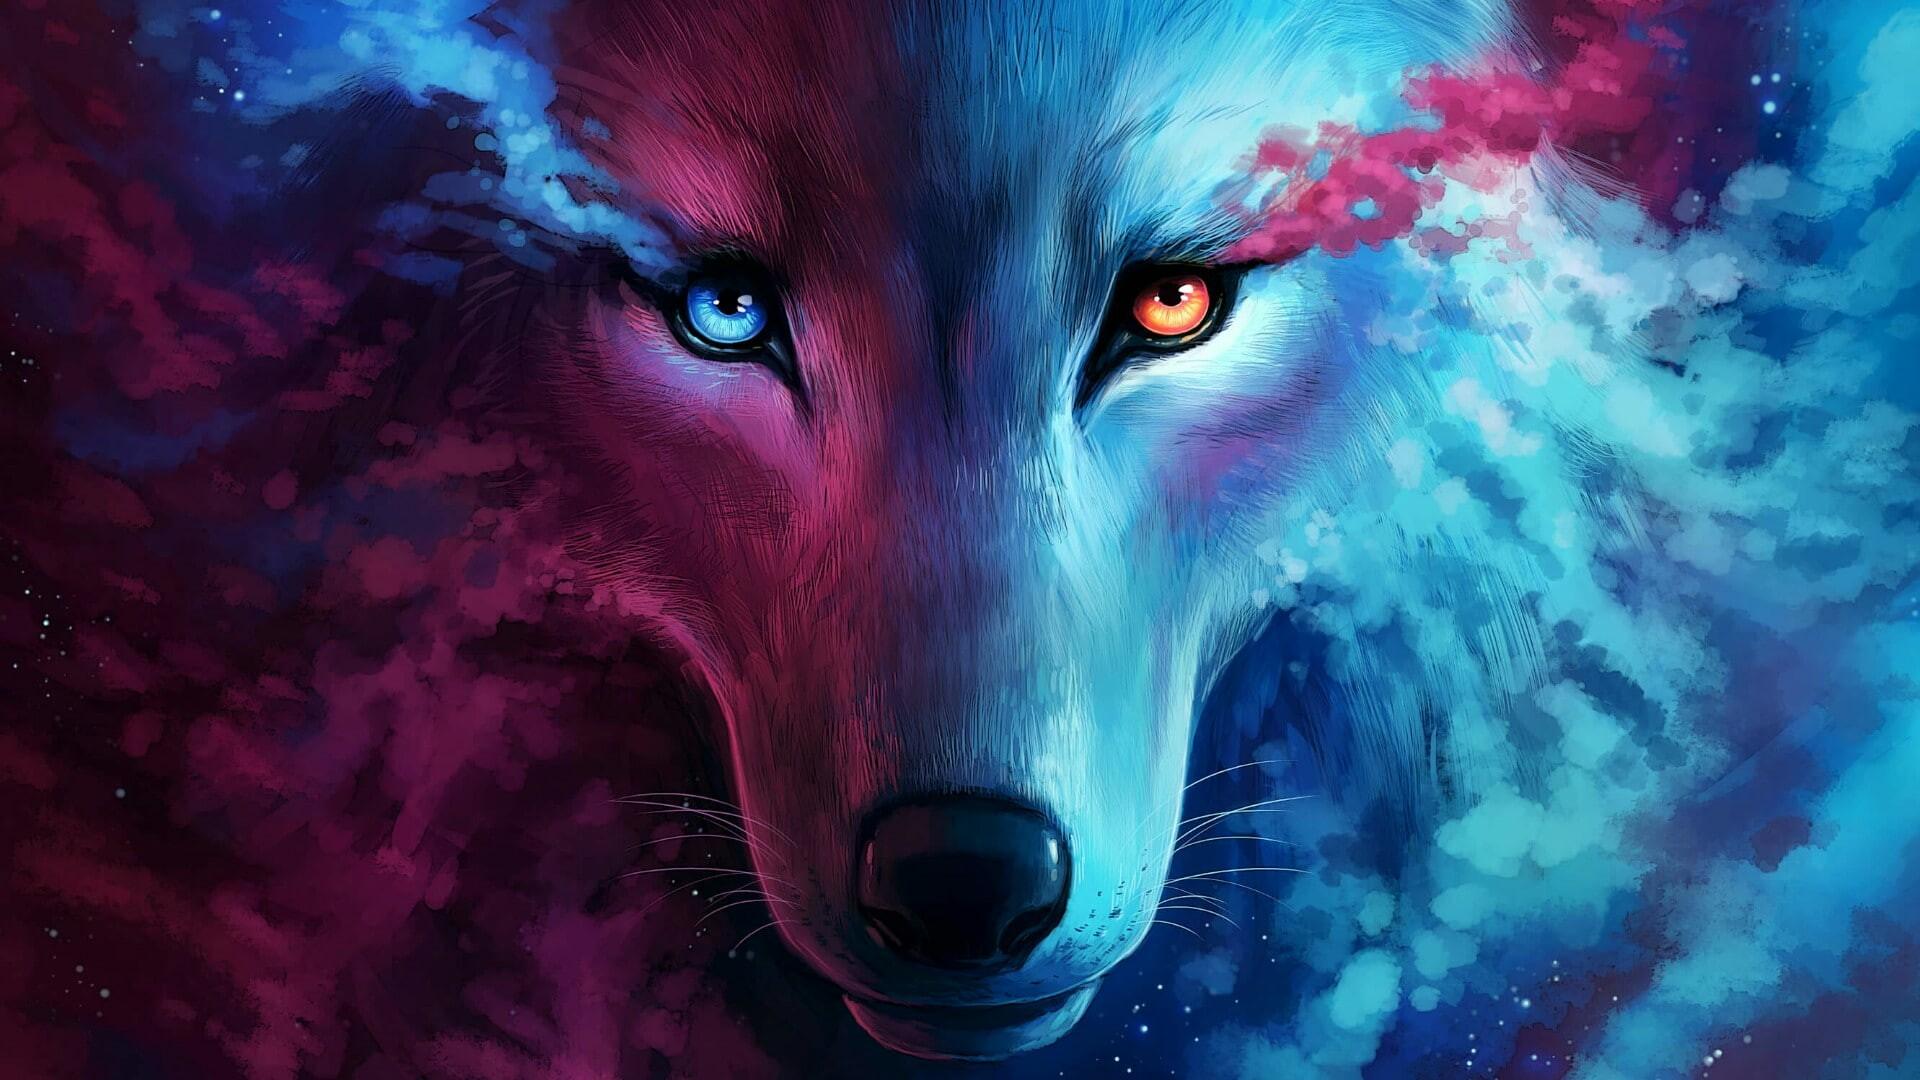 Best Cool Wolf Wallpaper 2021 Cute Wallpapers 1920x1080